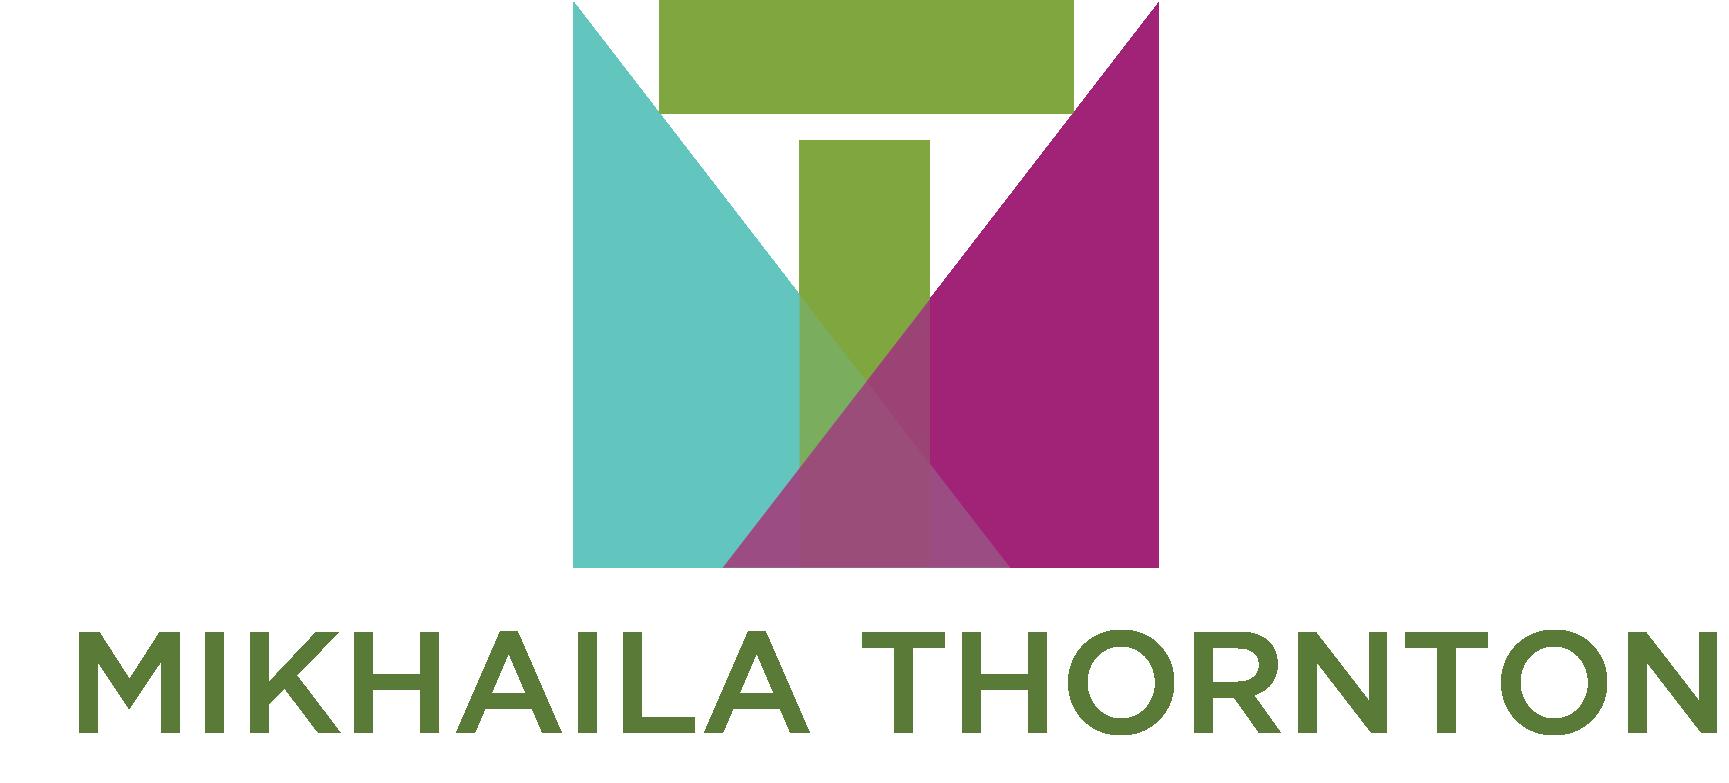 Mikhaila Thornton